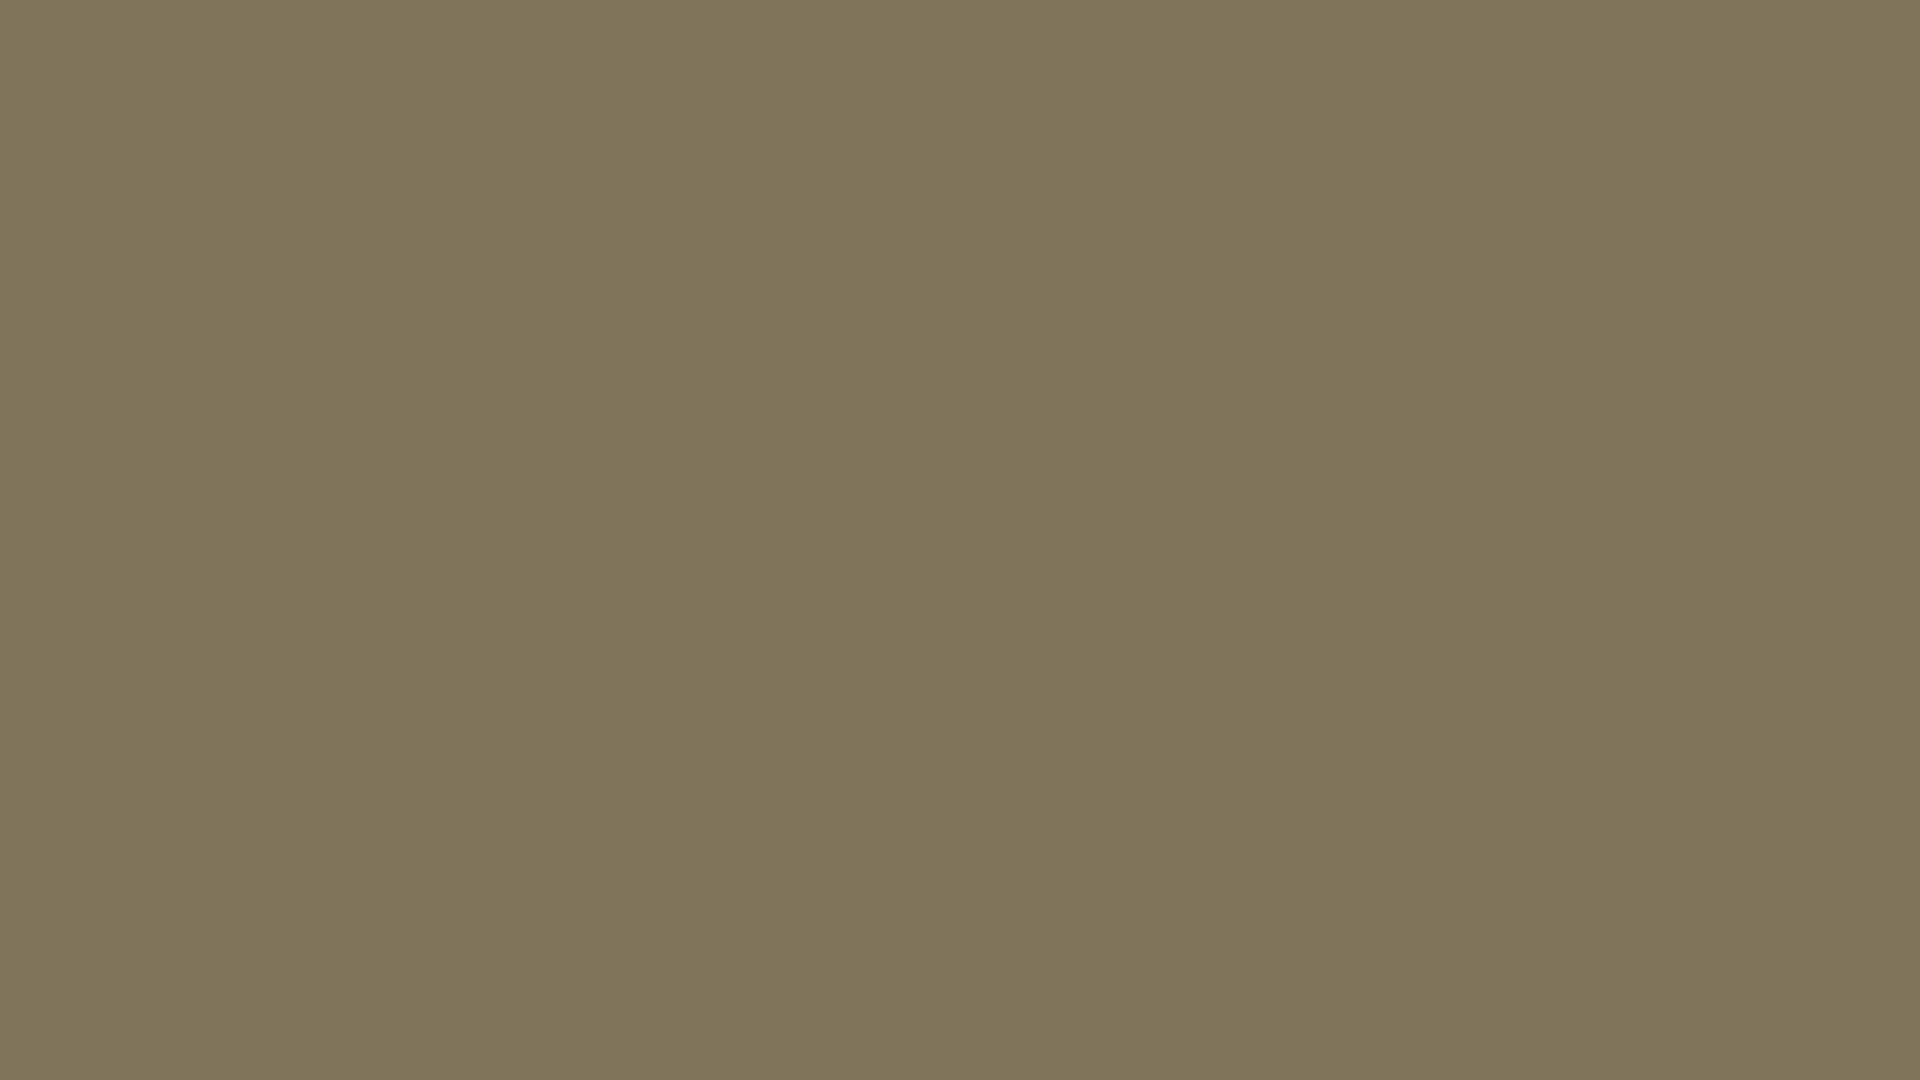 1920x1080 Spanish Bistre Solid Color Background